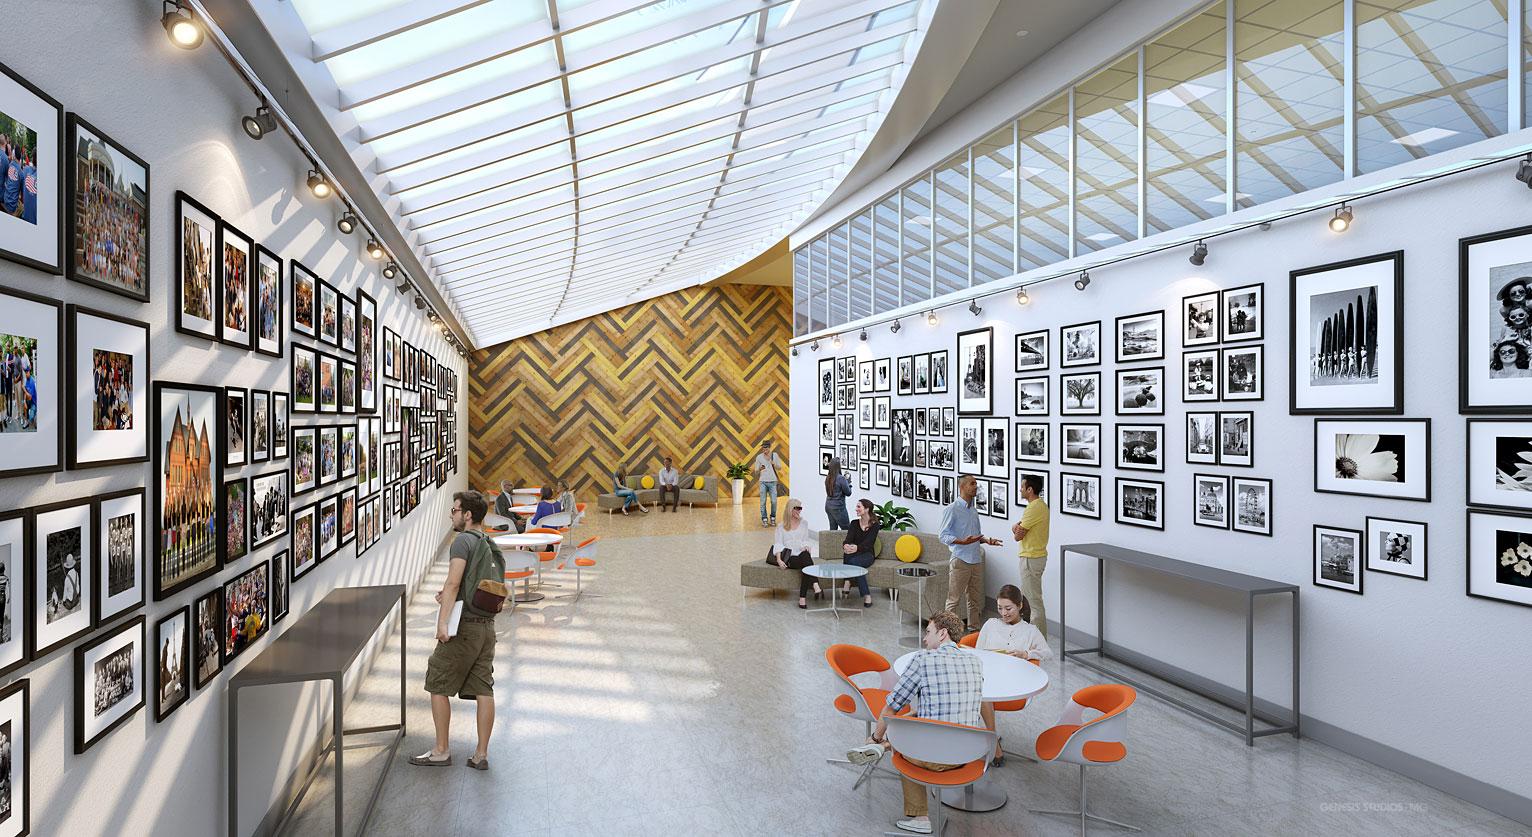 Architectural Renderings - Interior Digital Photorealistic